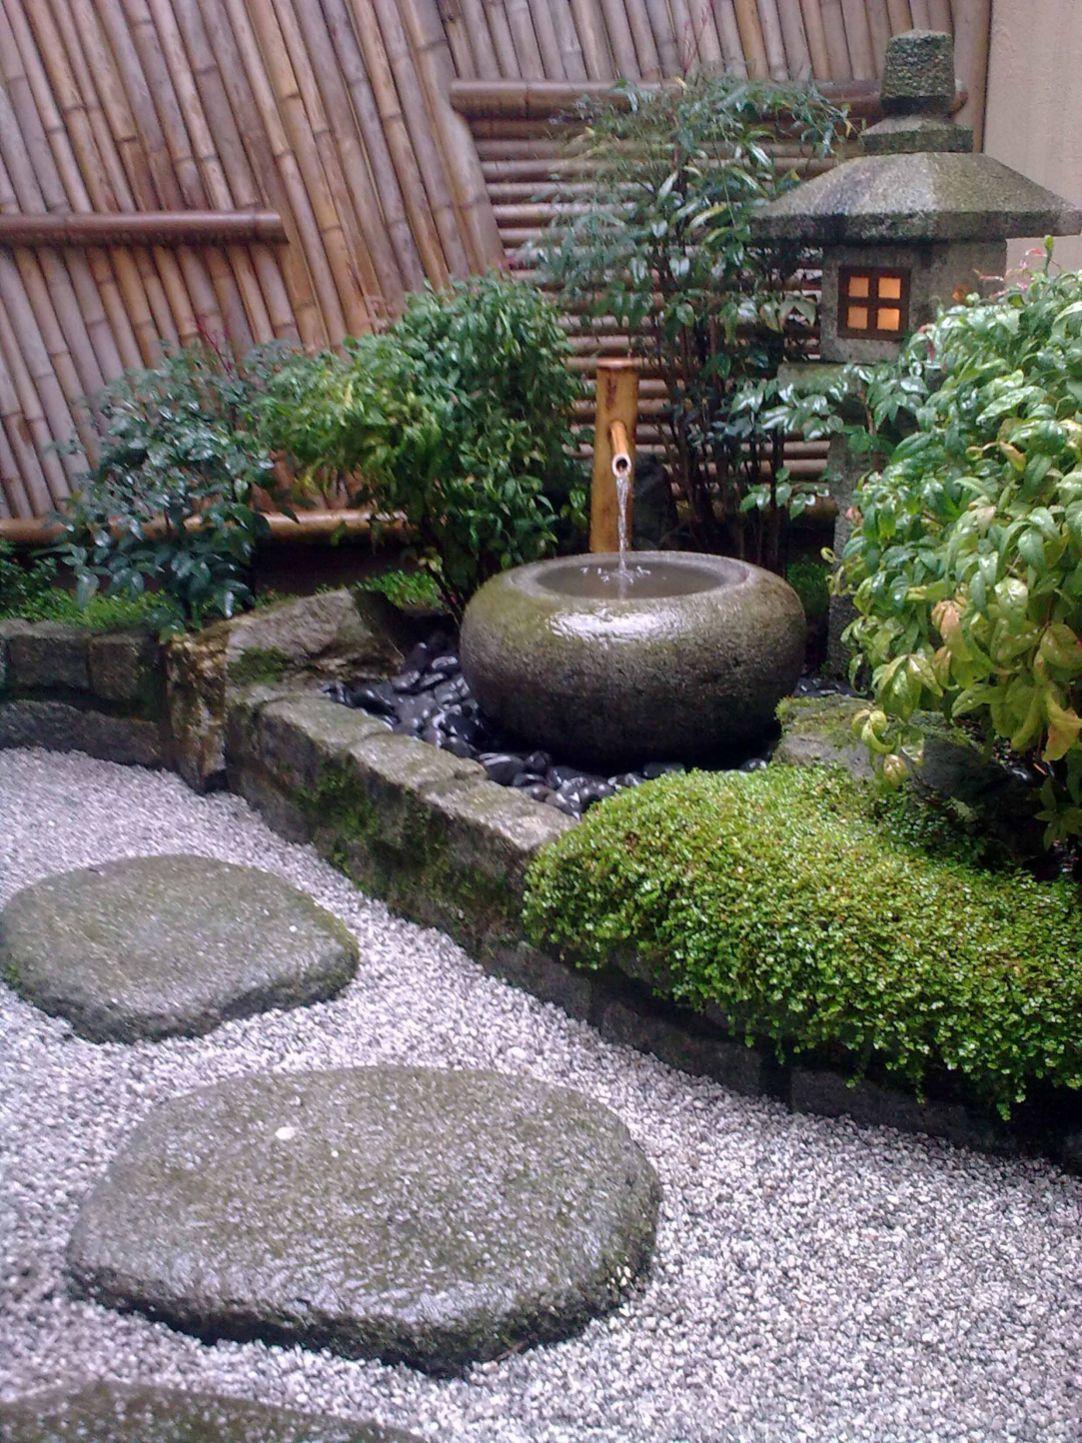 Creer Un Coin Zen Dans Son Jardin top 10 beautiful zen garden ideas for backyard   jardin d